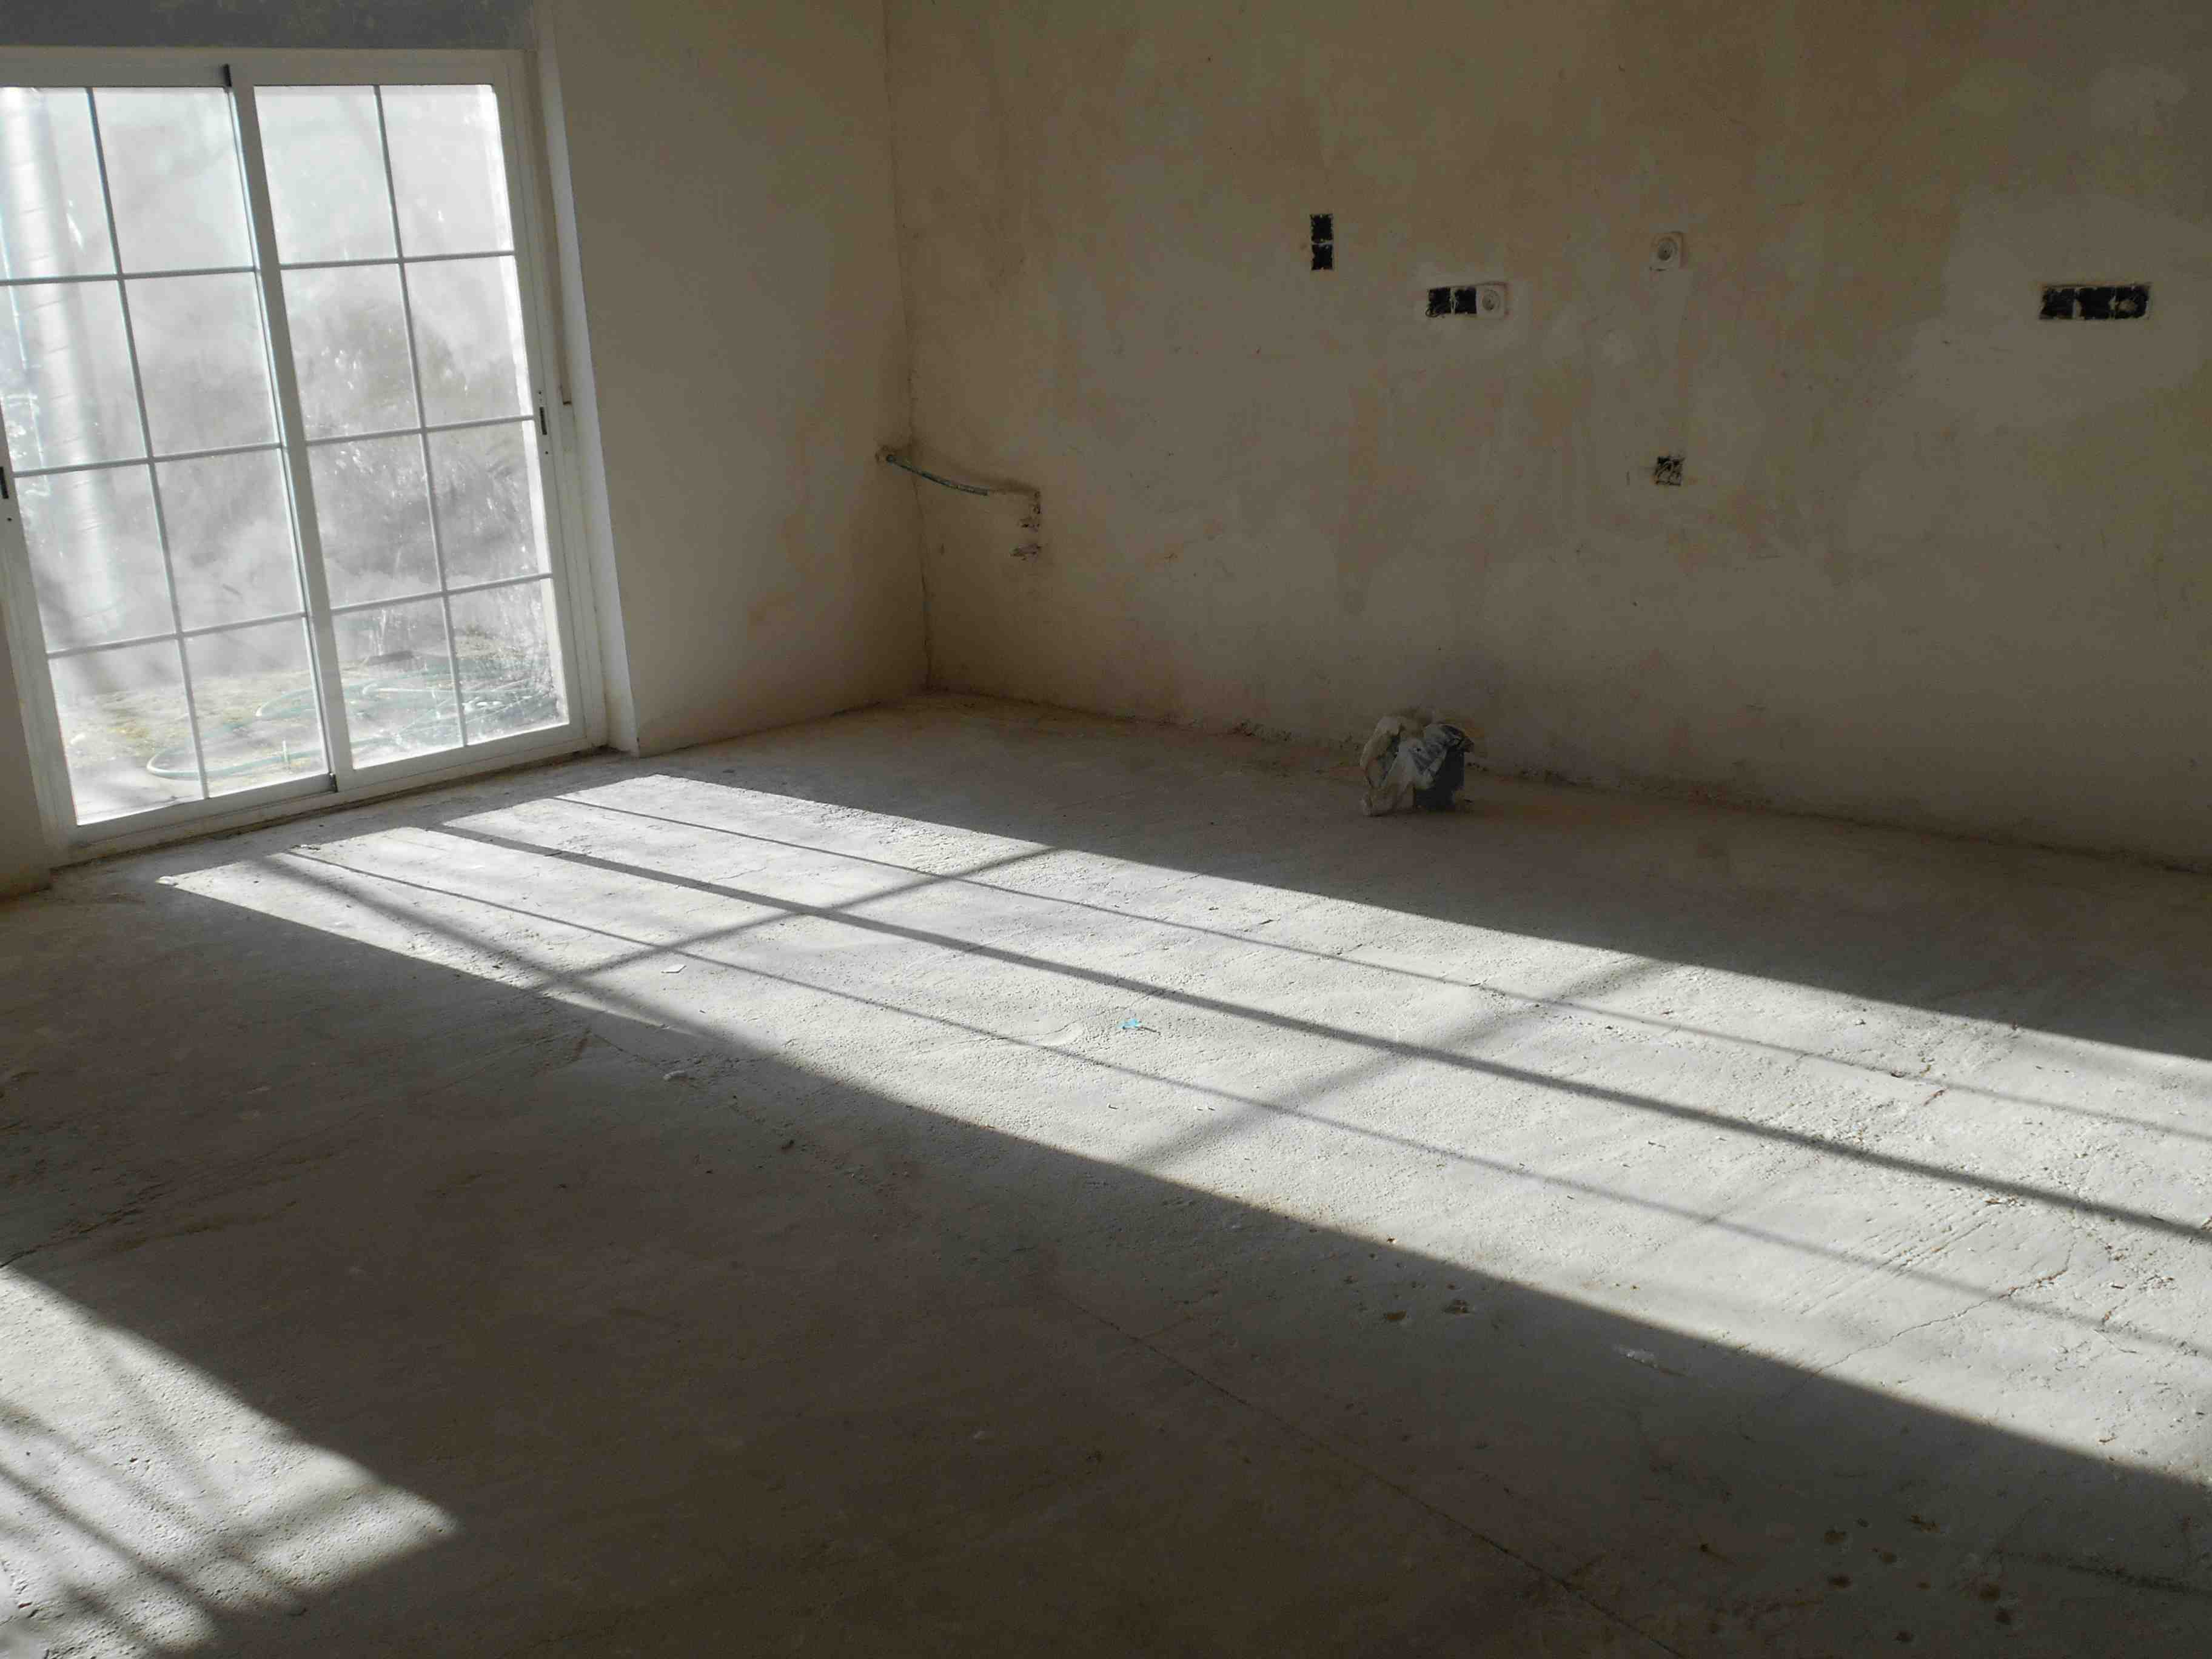 Casa en venta en Montañana, Zaragoza, Zaragoza, Avenida Montaña, 108.000 €, 3 habitaciones, 1 baño, 185 m2